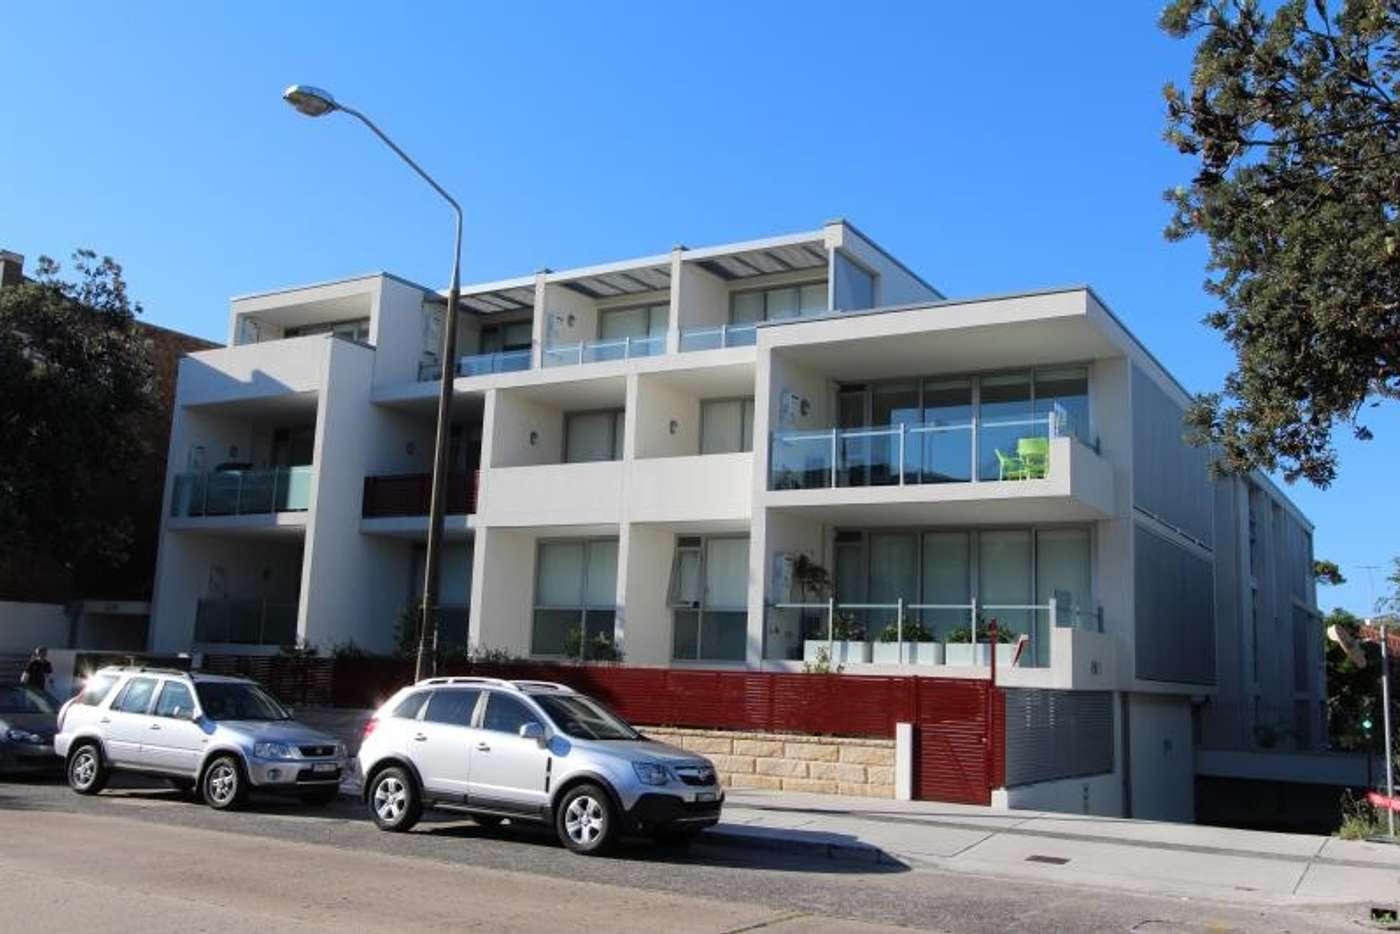 Main view of Homely studio listing, 24/108-112 Curlewis Street, Bondi Beach NSW 2026